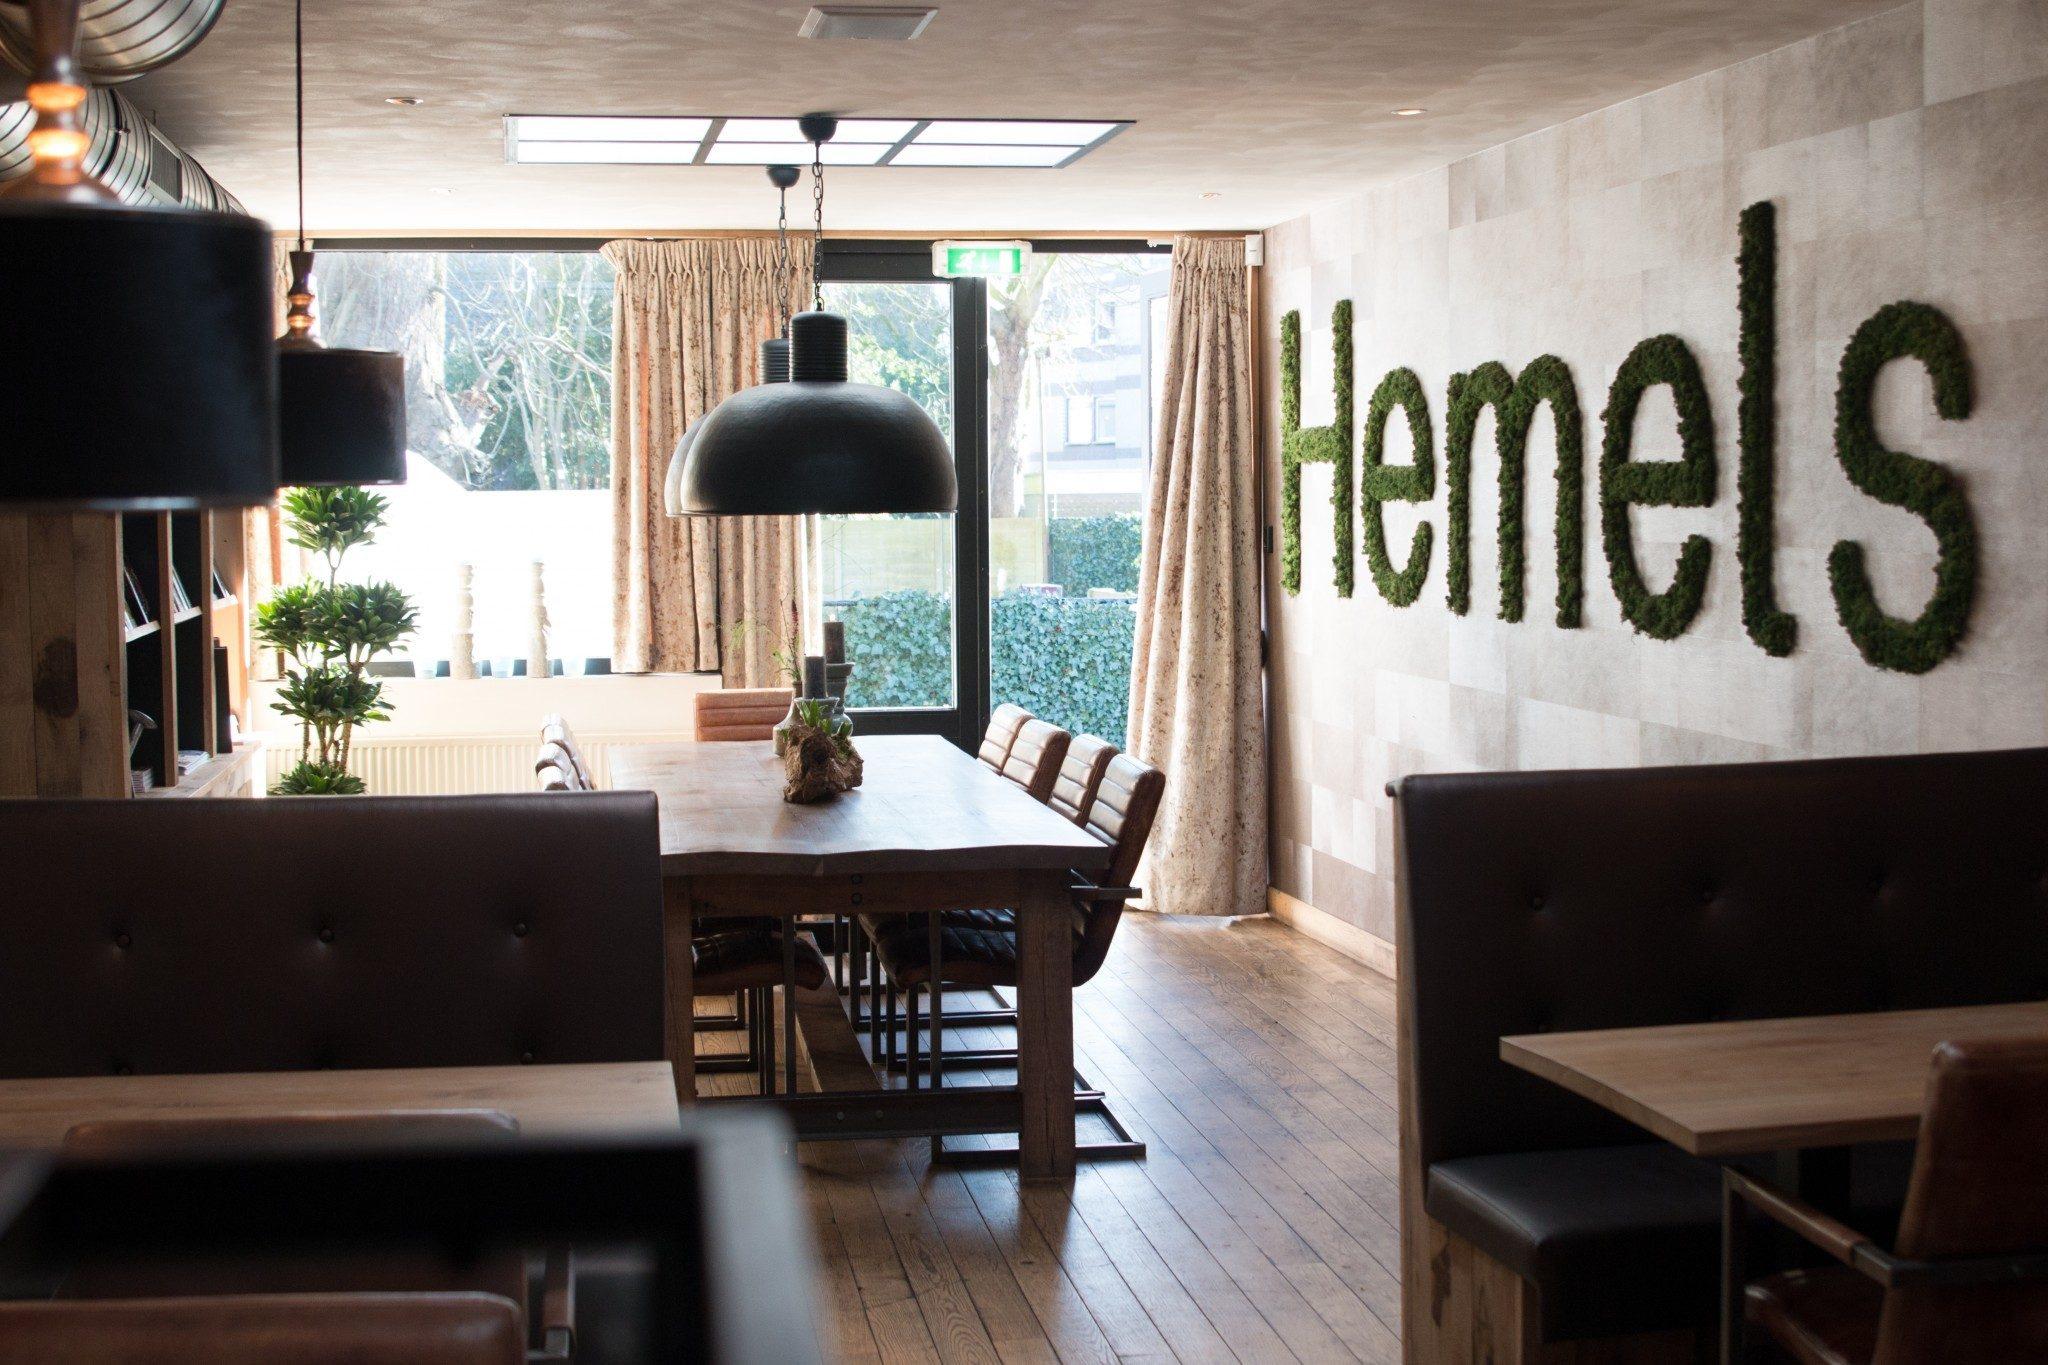 Interieur Restaurant Hemels Breda 1